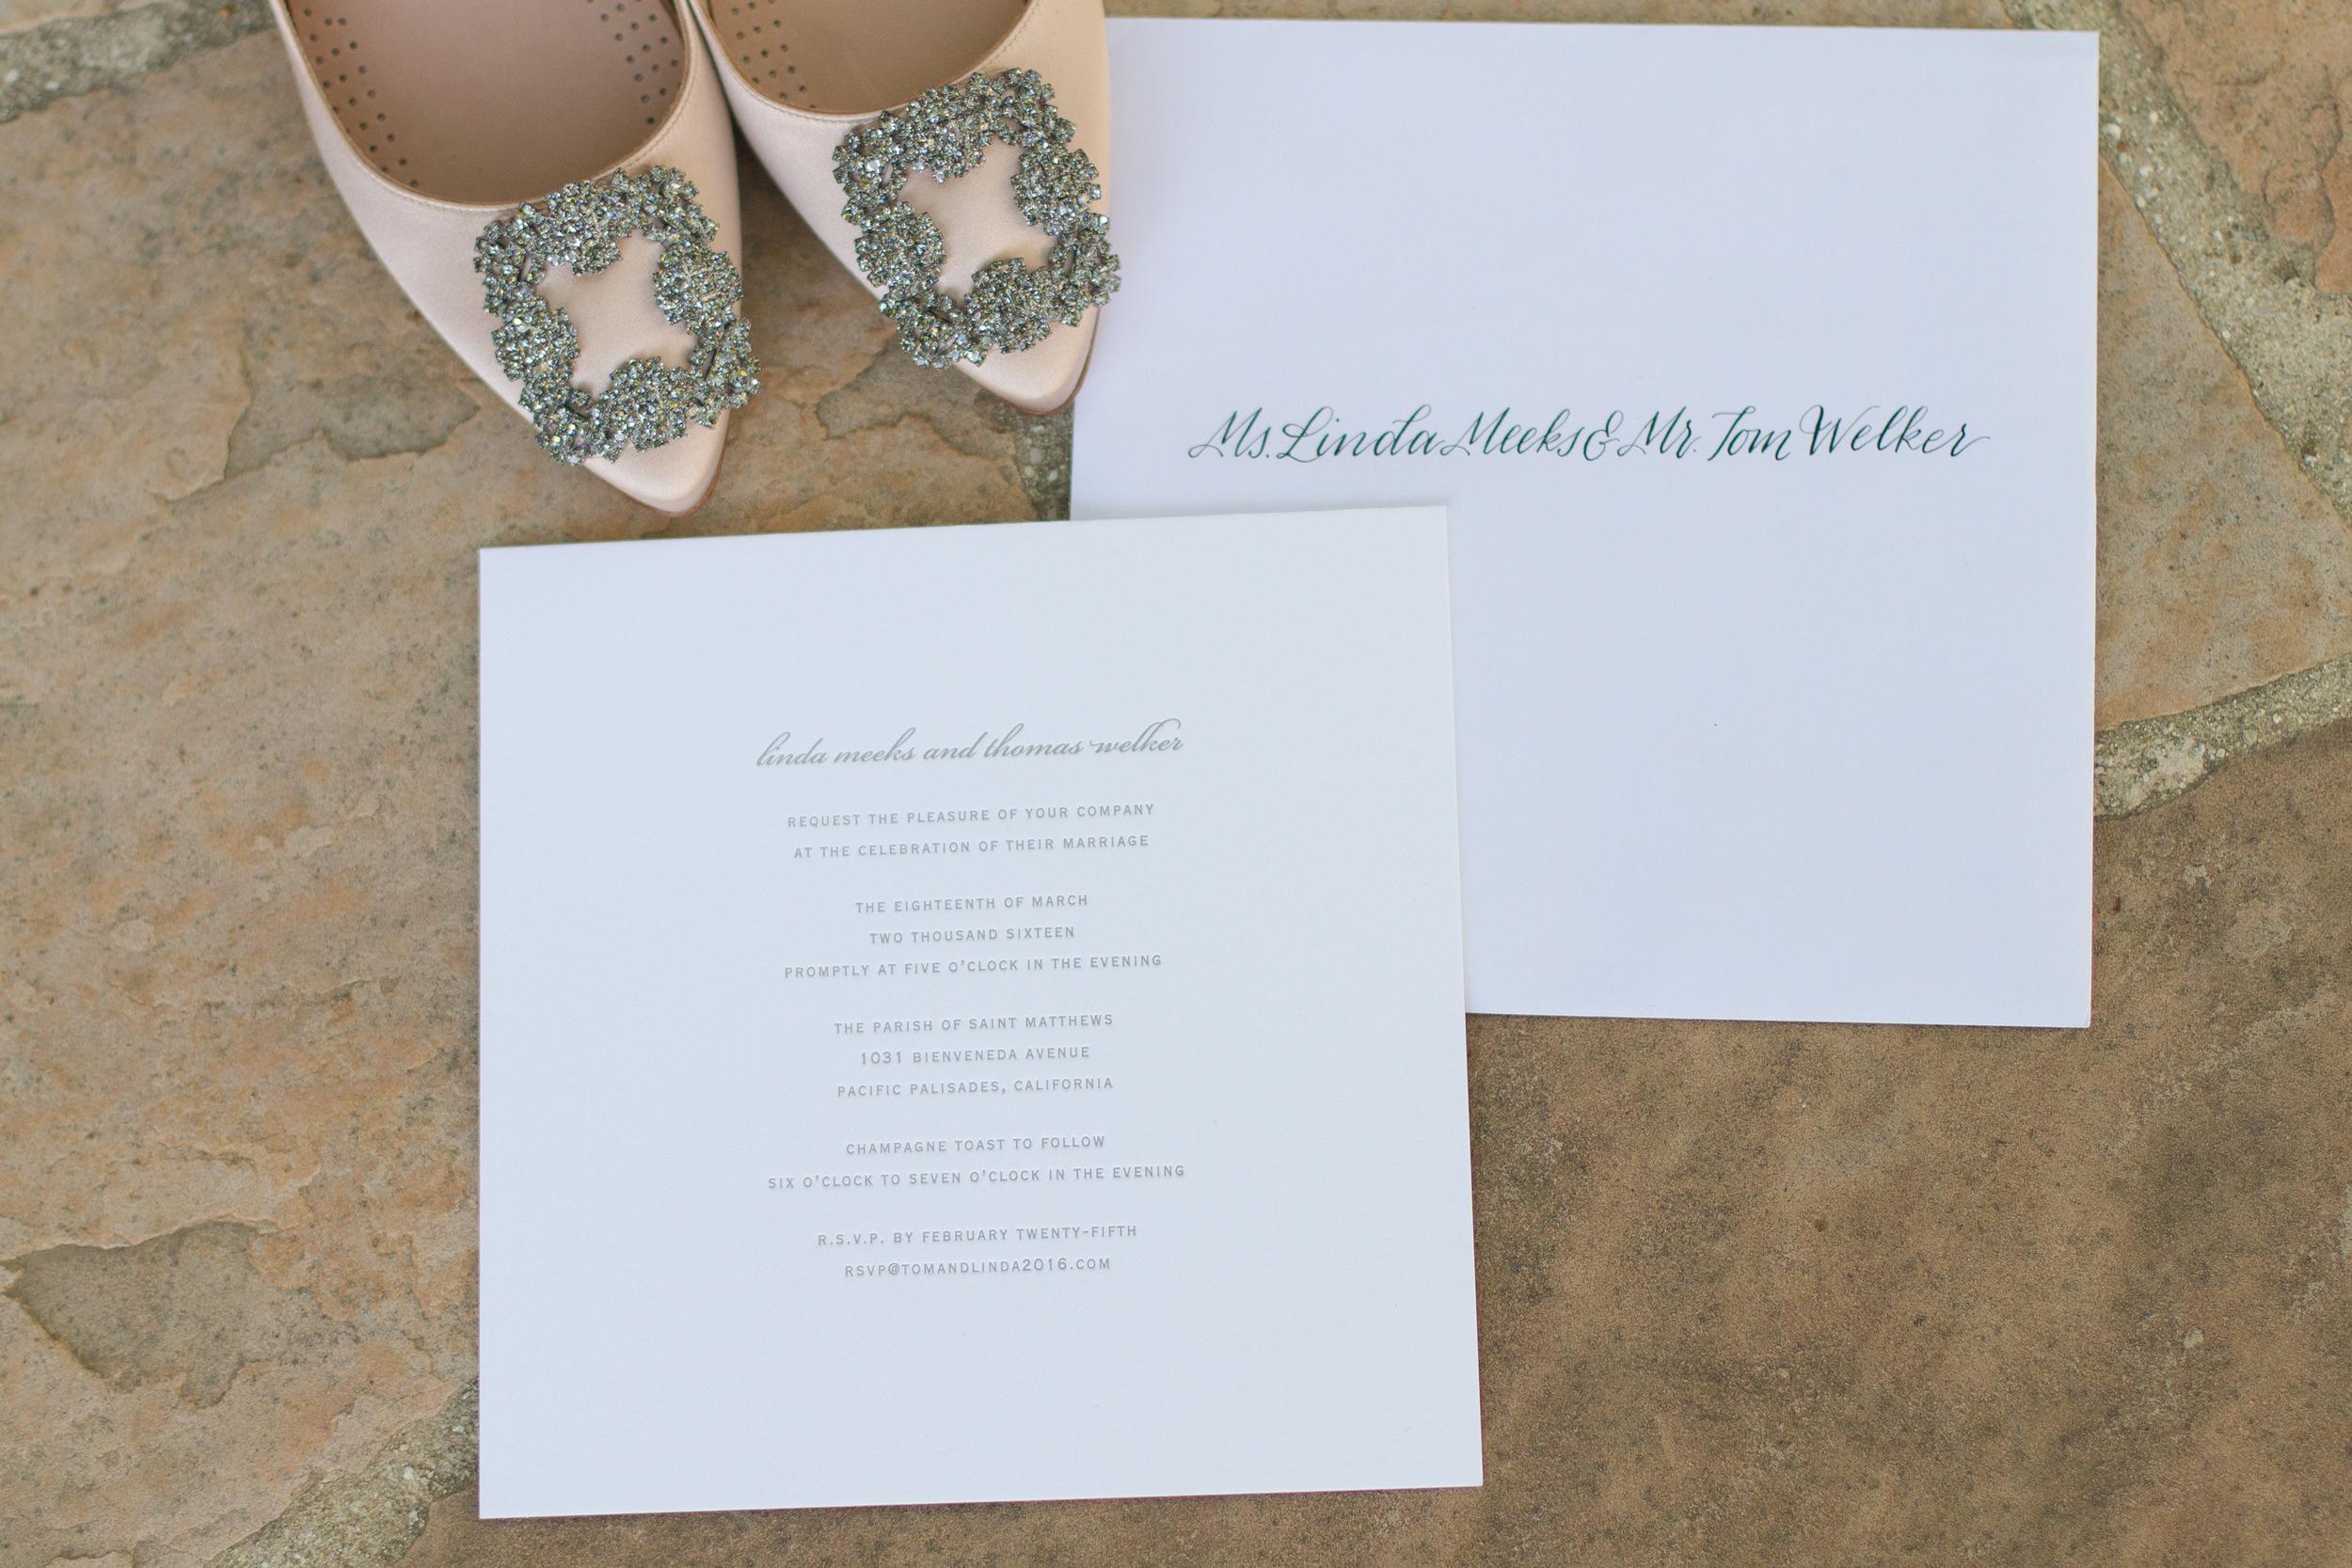 001 - Invitation & Shoes.jpg